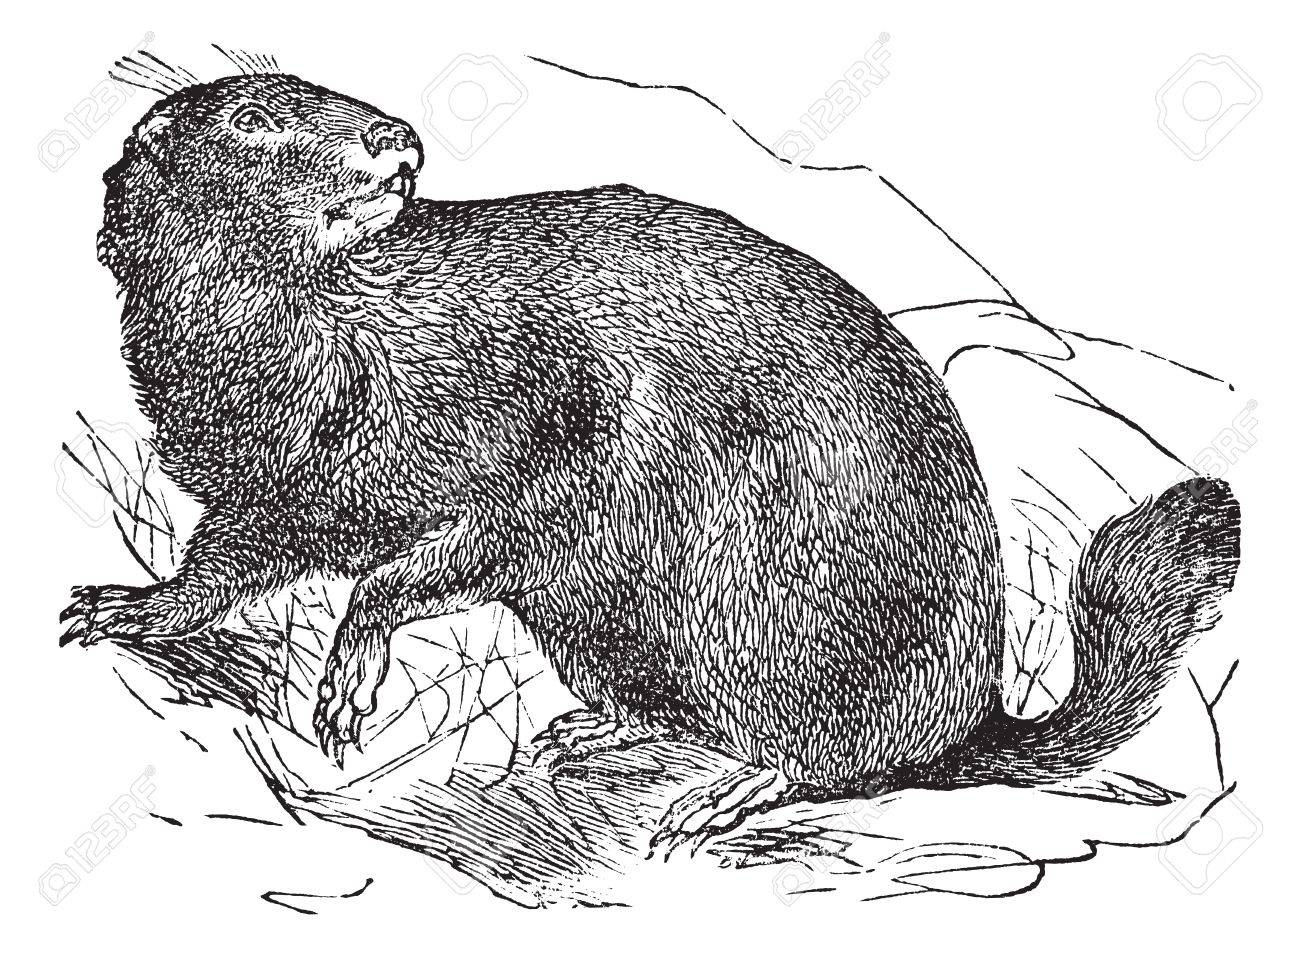 Alpine Marmot or Marmota marmota, vintage engraving. Old engraved illustration of Alpine Marmot in the meadow. Stock Vector - 13771509